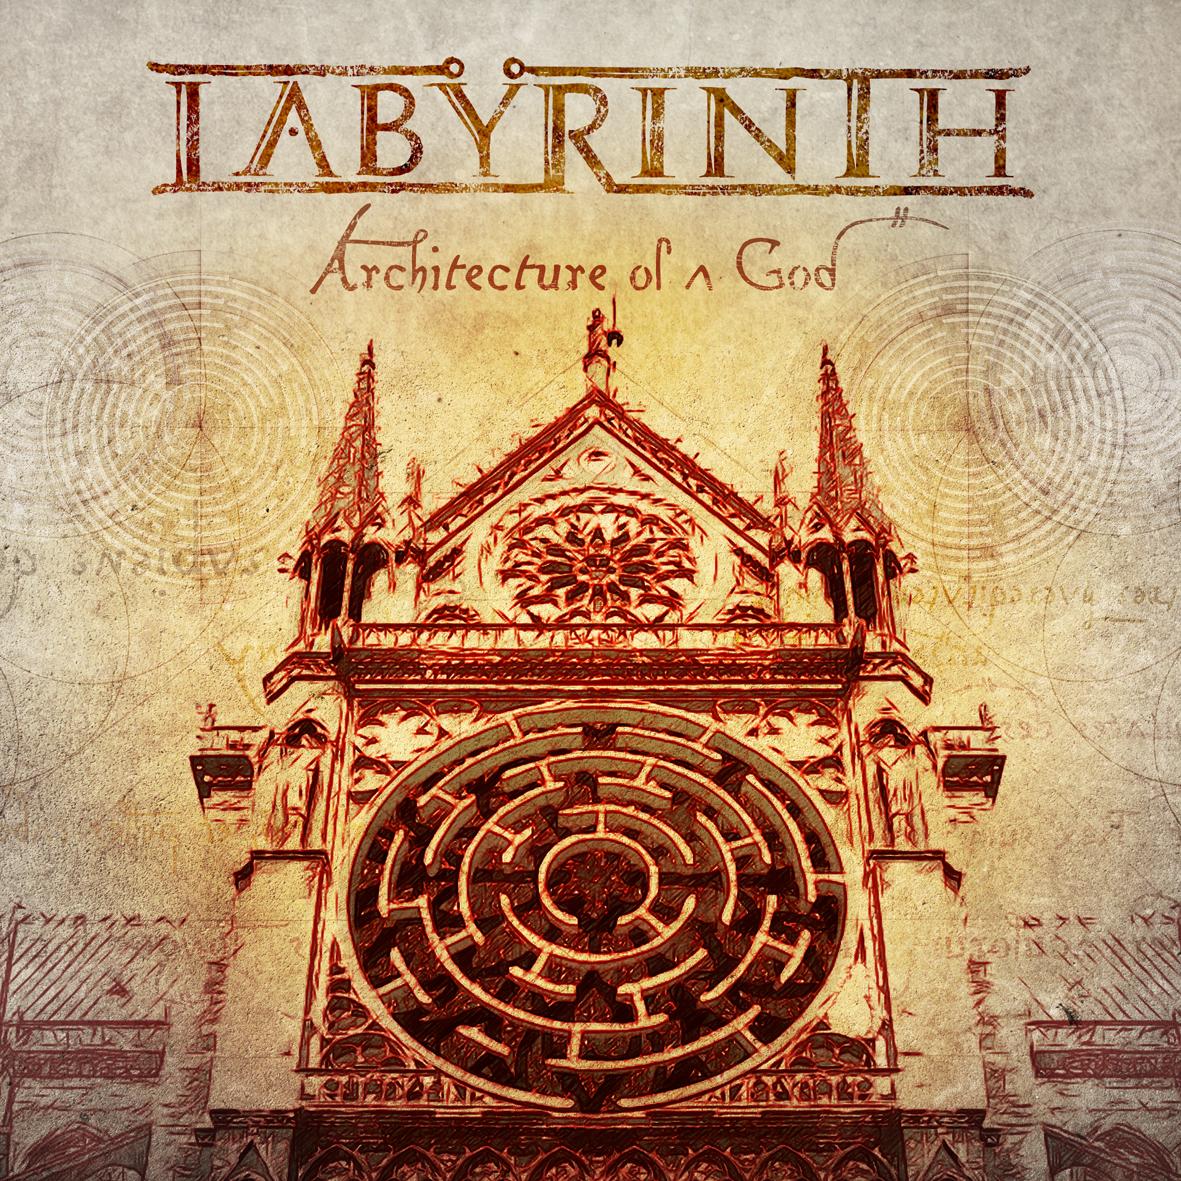 LABYRINTH aoag COVER